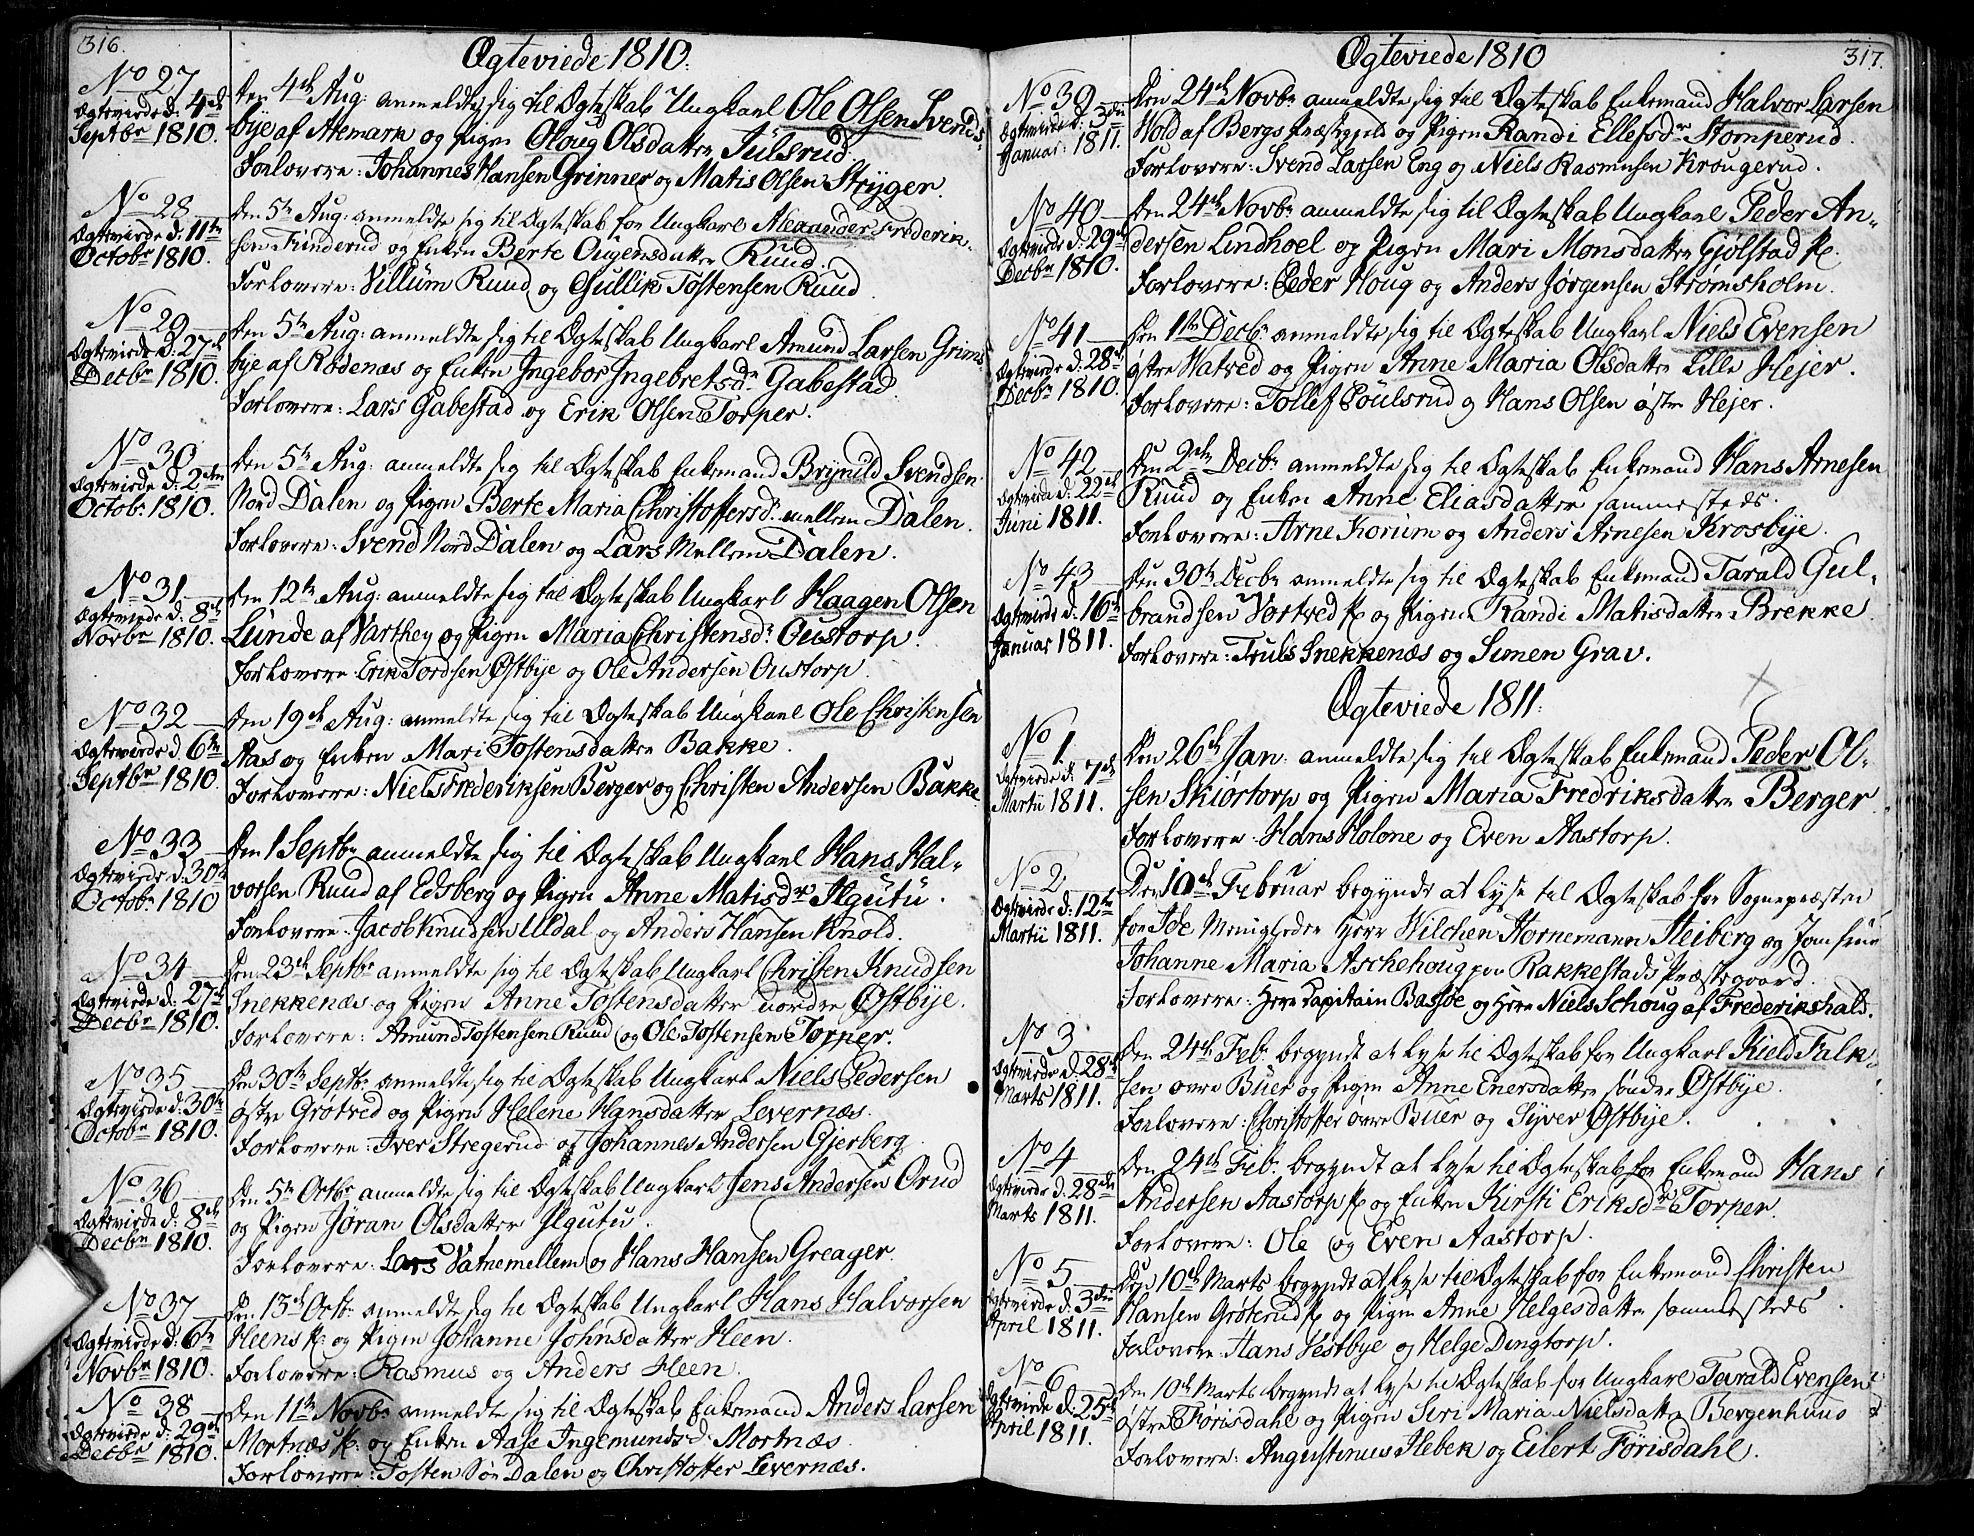 SAO, Rakkestad prestekontor Kirkebøker, F/Fa/L0005: Ministerialbok nr. I 5, 1784-1814, s. 316-317